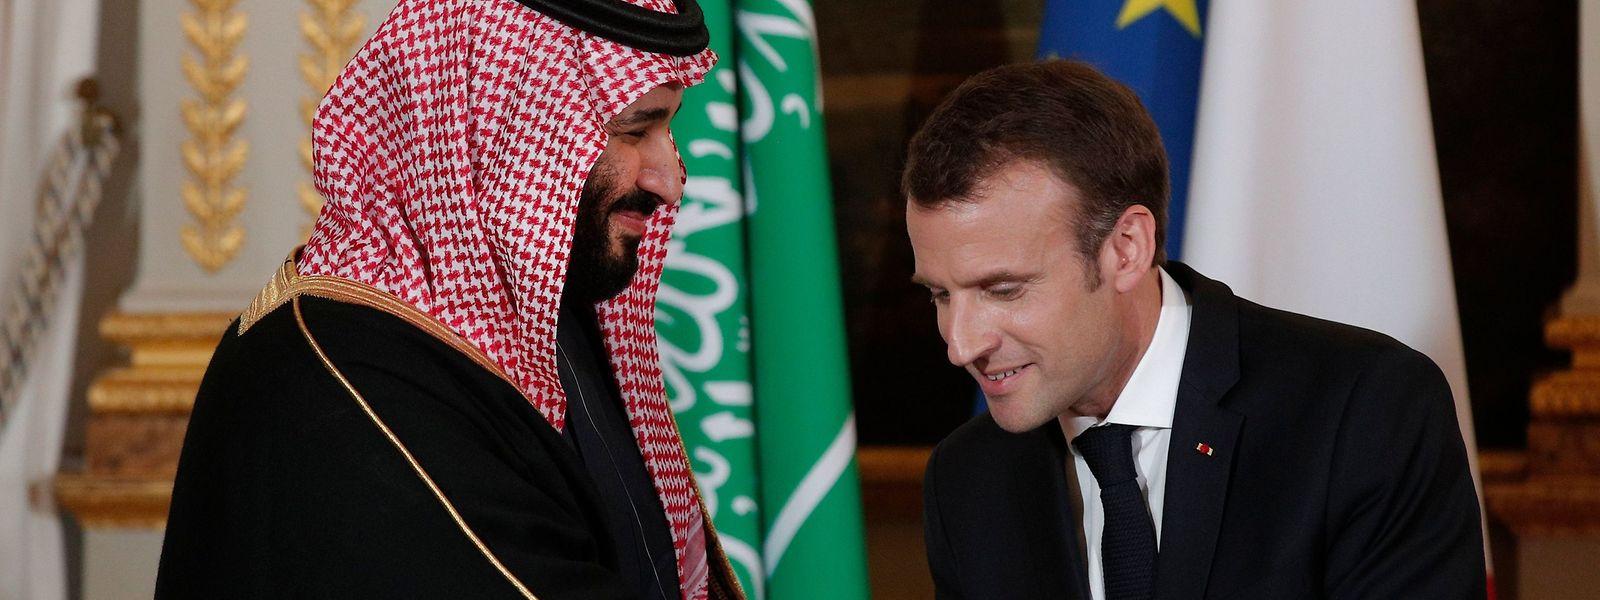 O príncipe herdeiro da Arábia Saudita, Mohamed bin Salman, e o presidente francês Emmanuel Macron.